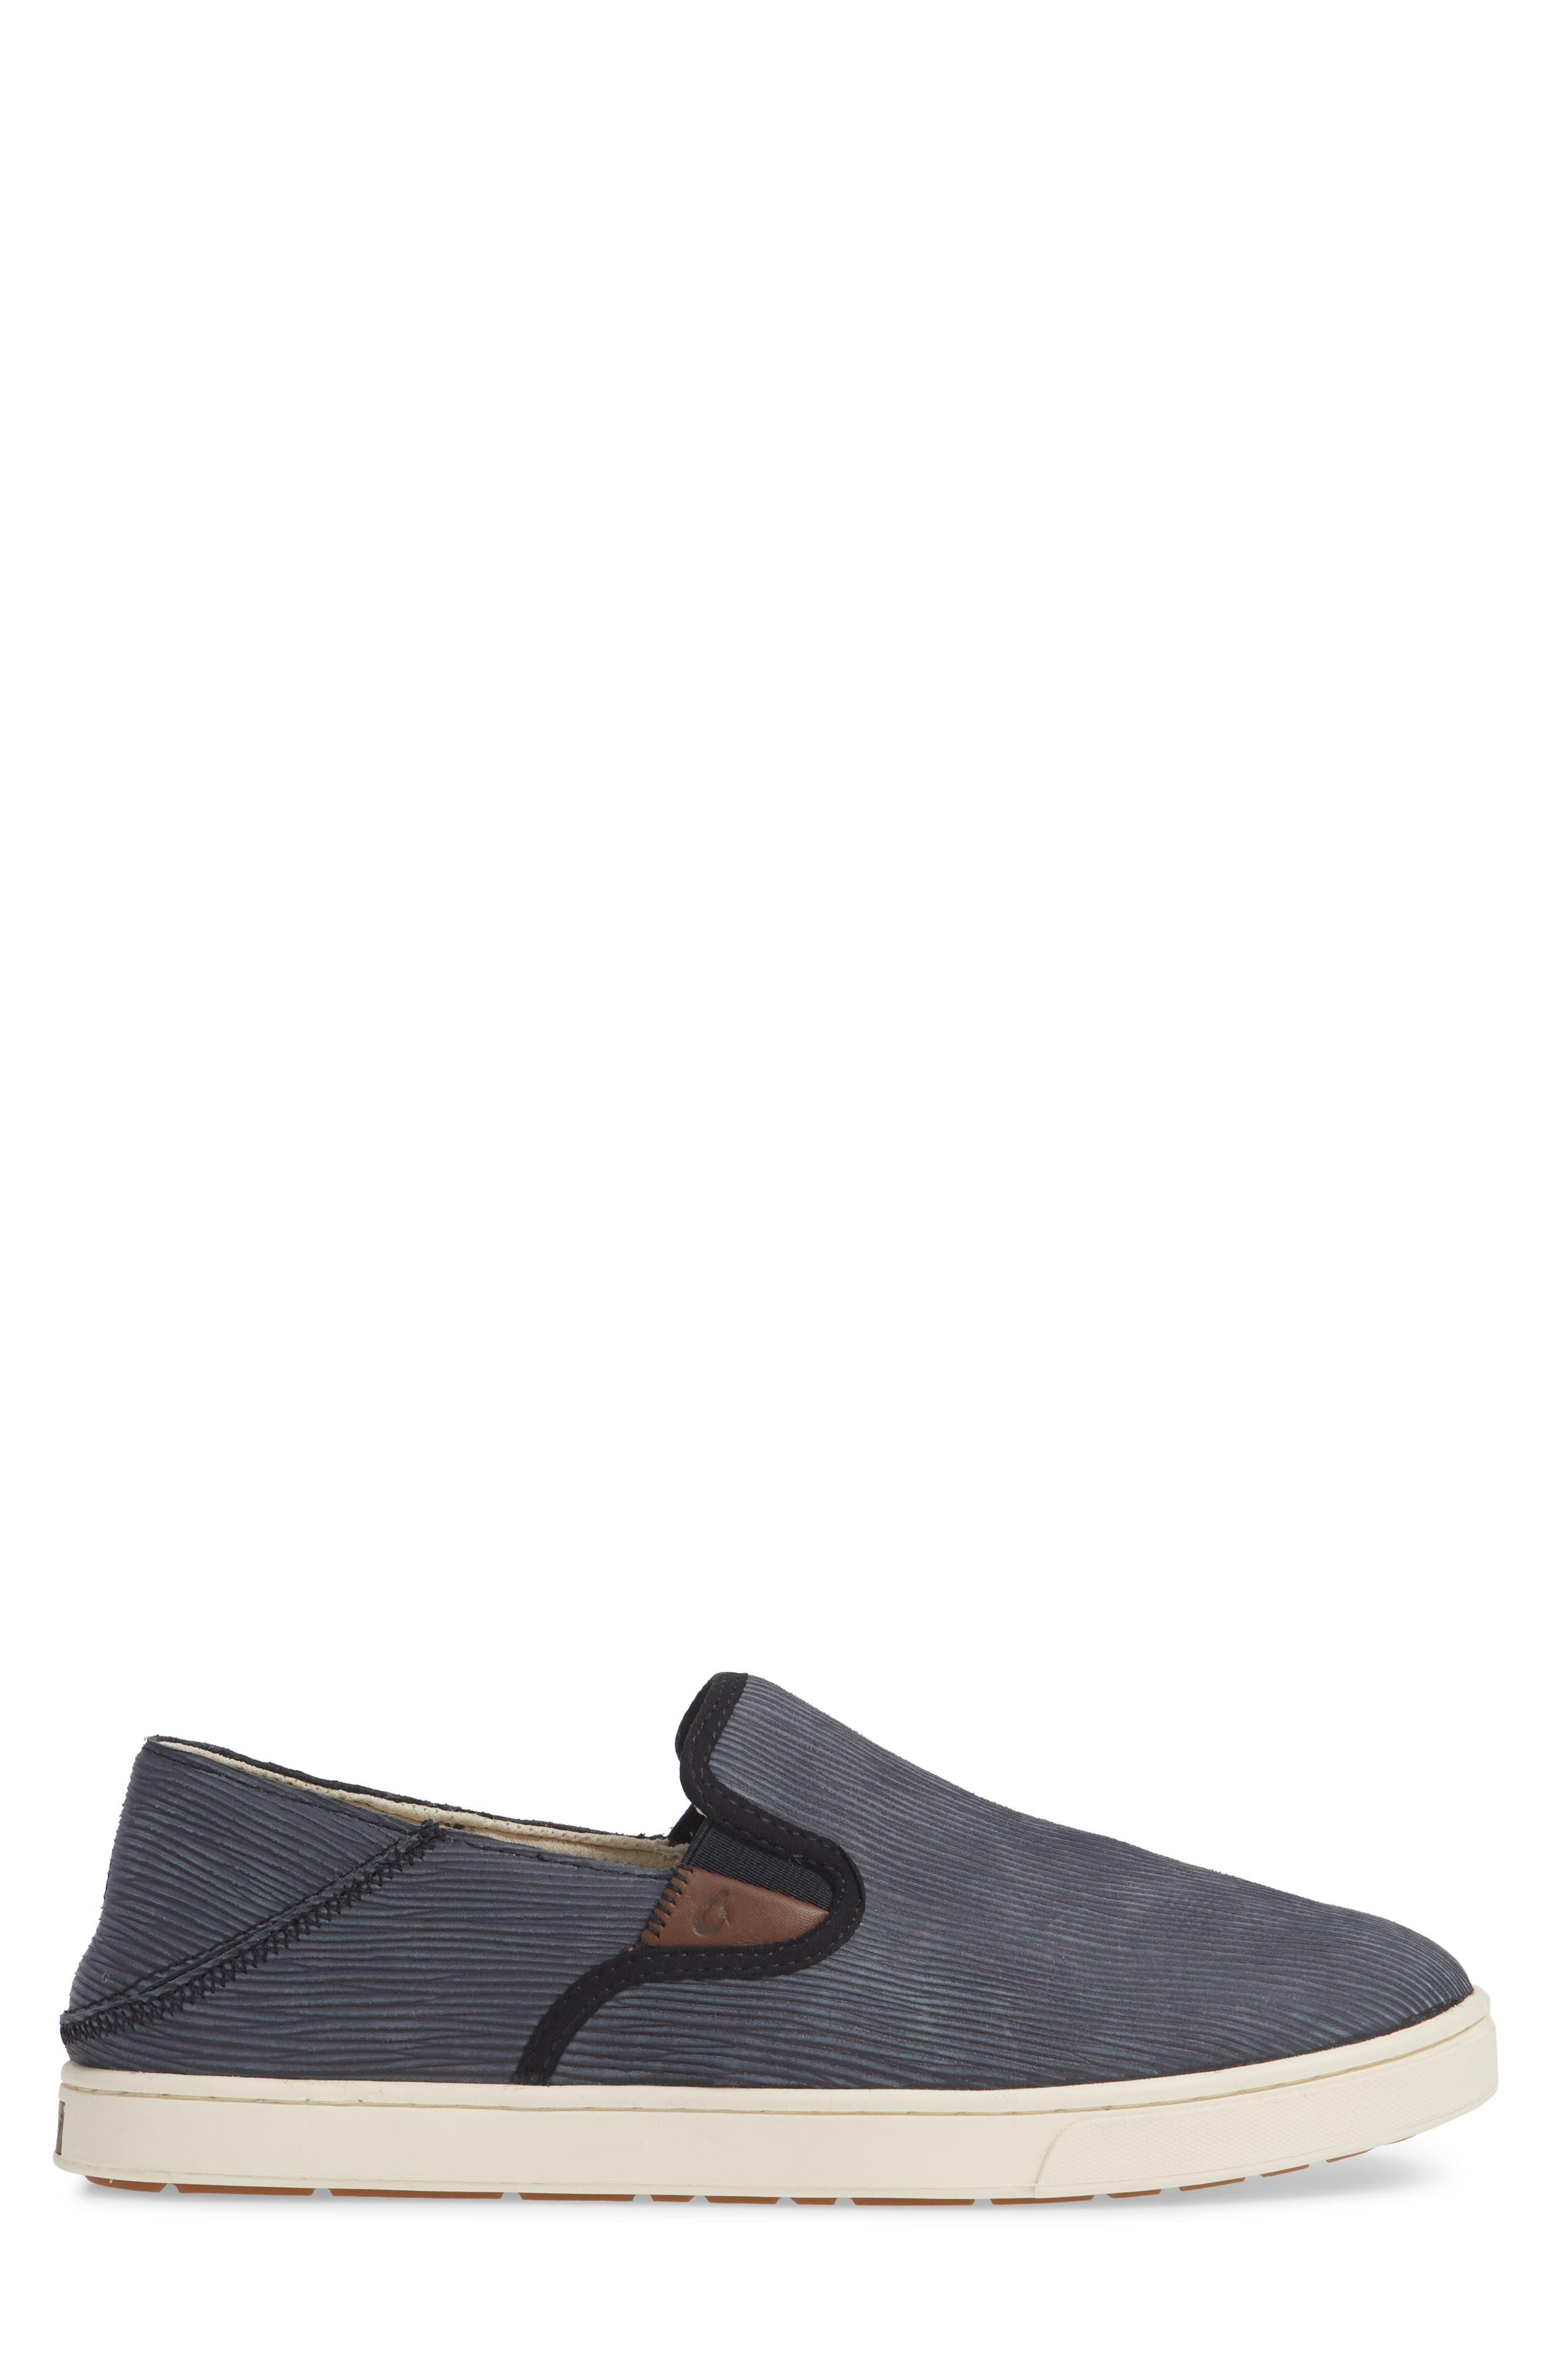 Kahu Kai Collapsible Slip-On Sneaker,                             Alternate thumbnail 3, color,                             DARK SHADOW/ OFF WHITE LEATHER